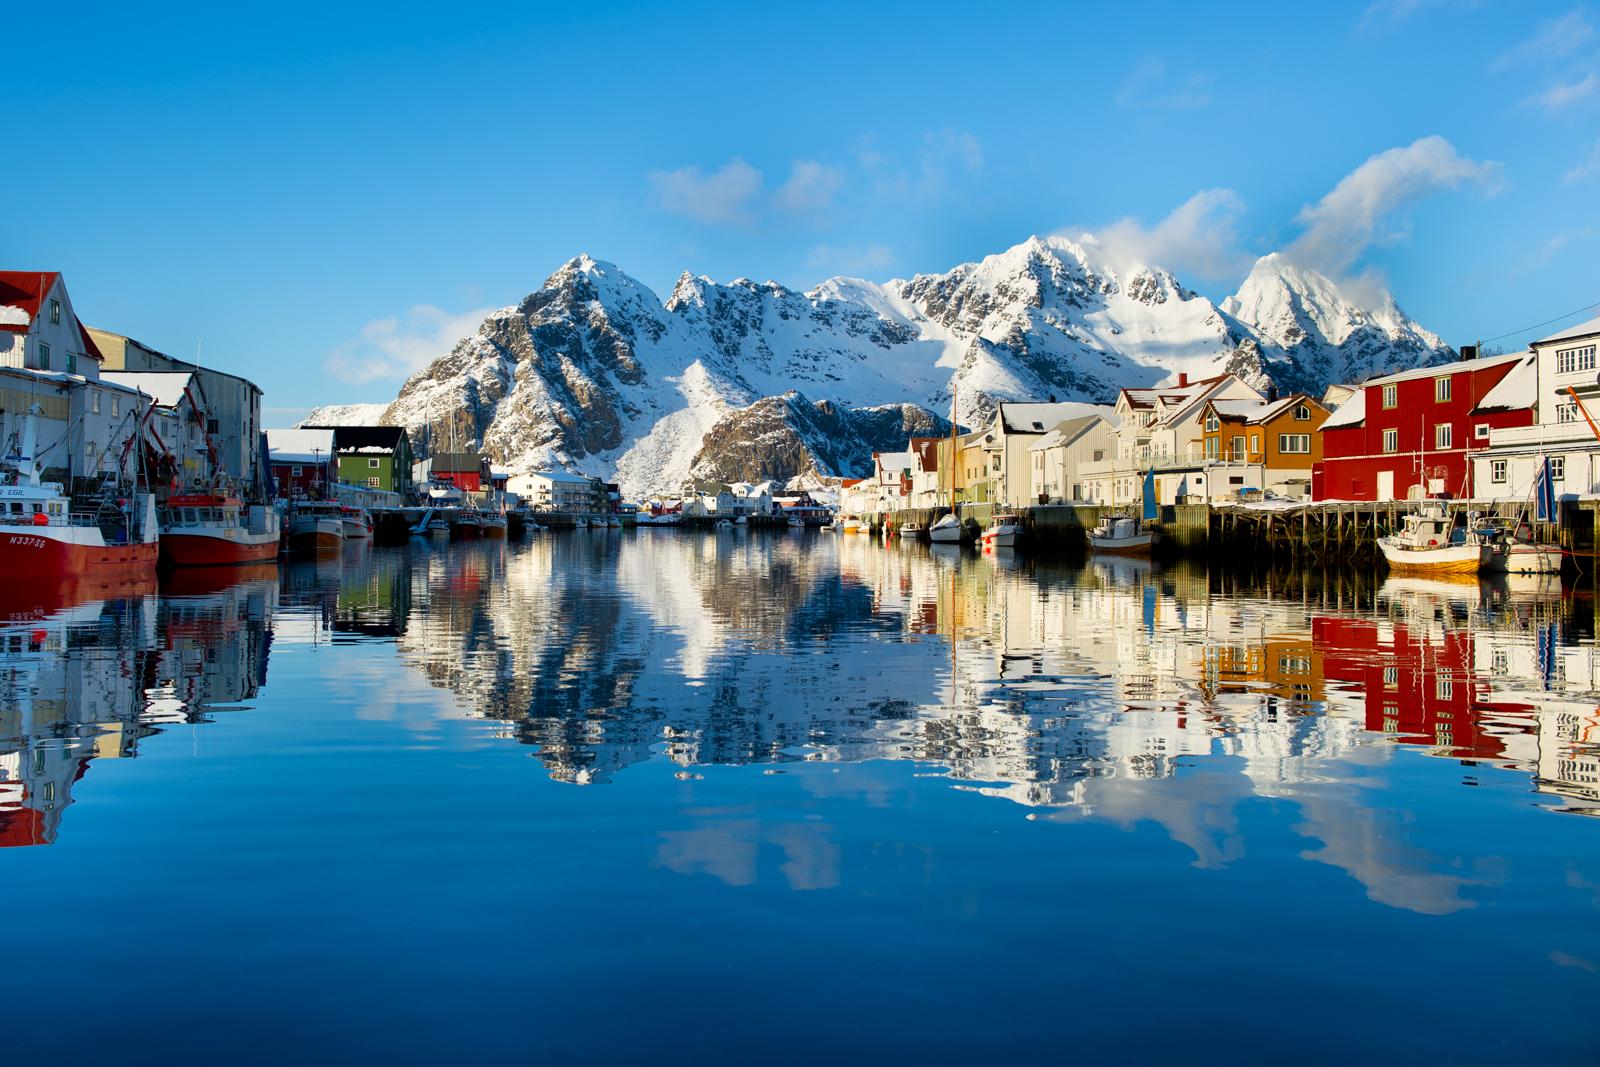 Amazing Lofoten Pictures & Backgrounds